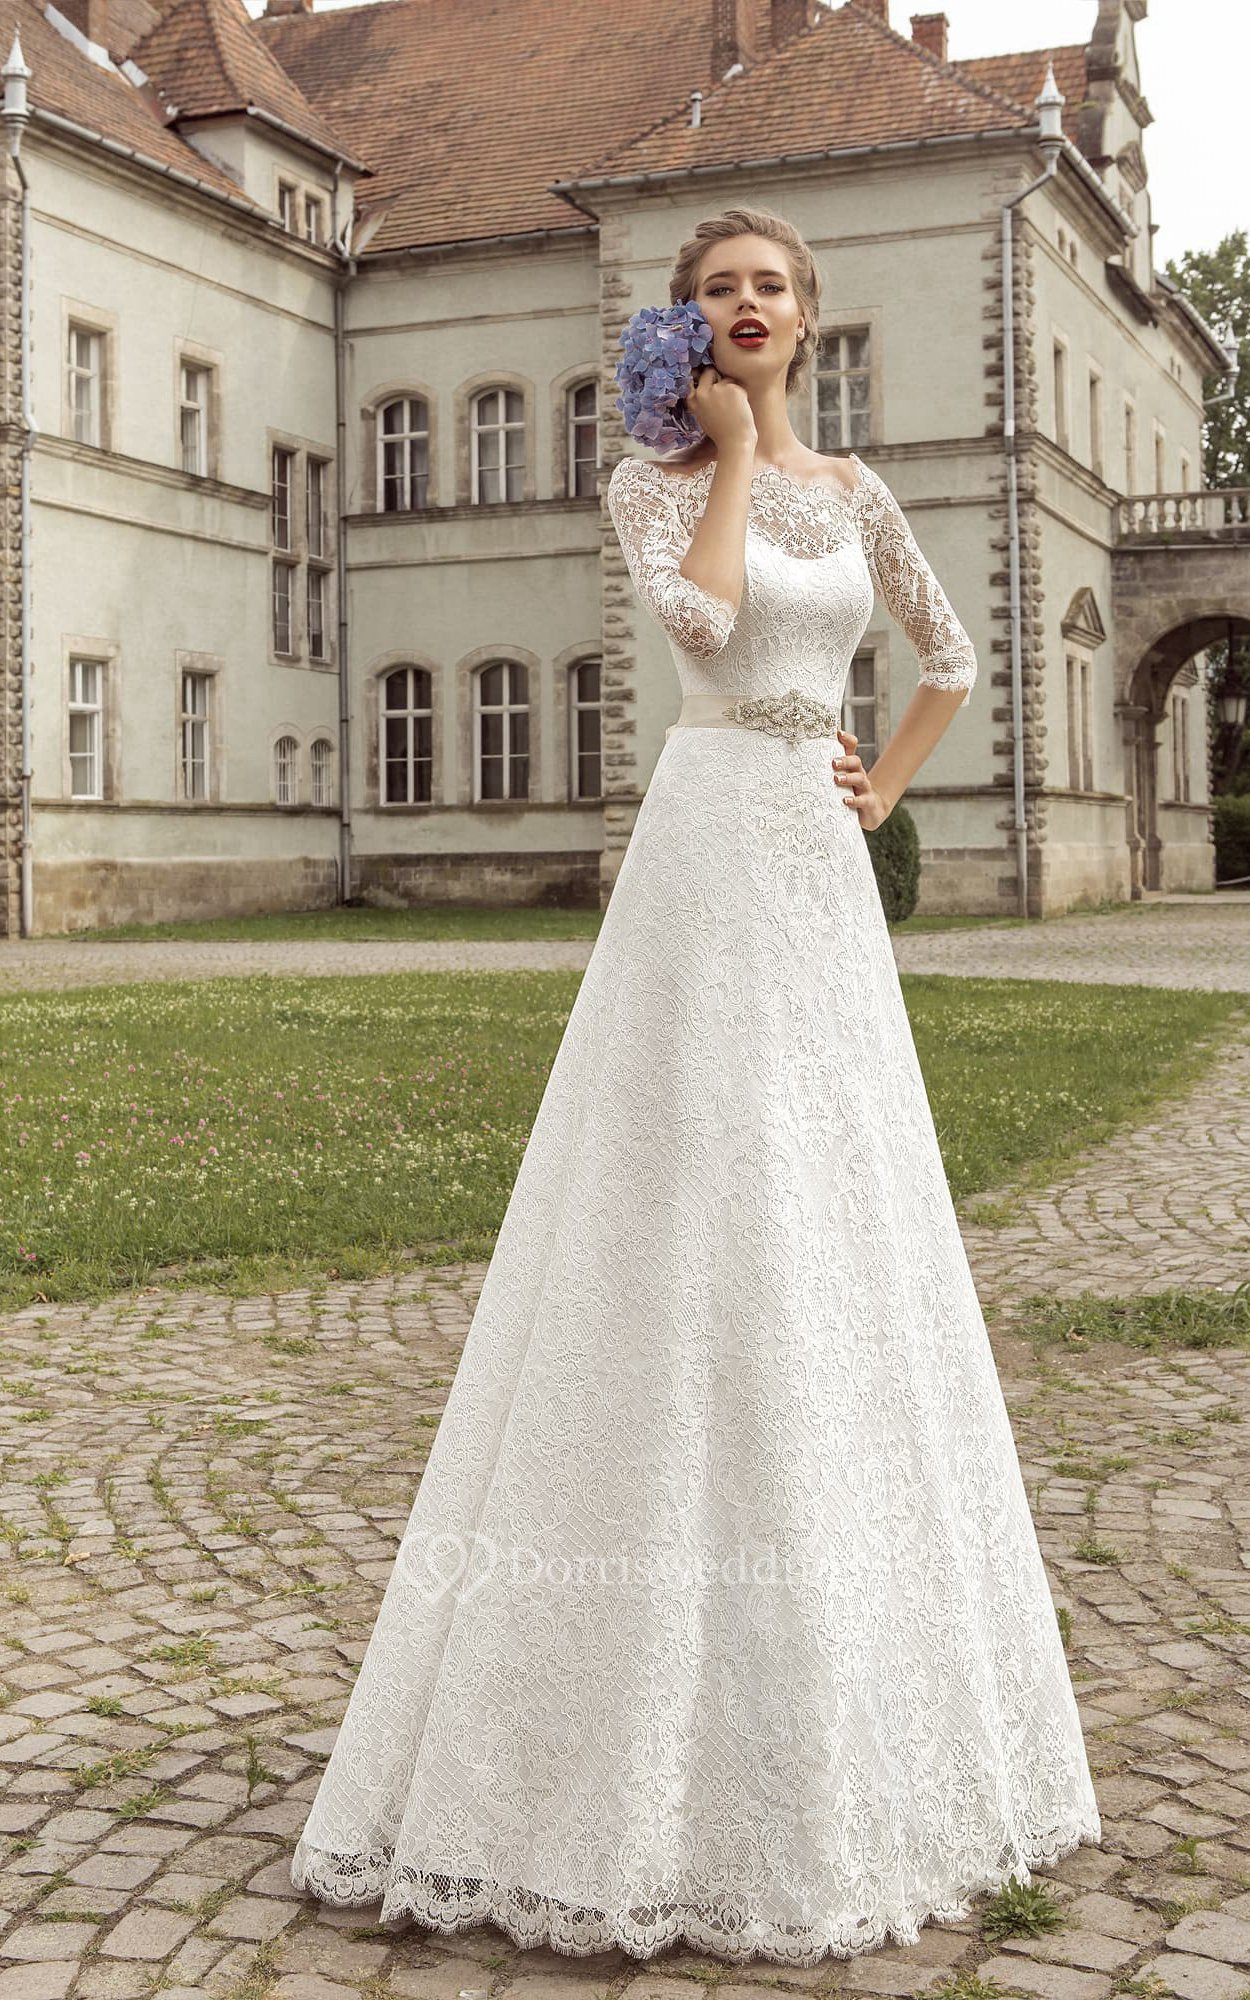 mormon wedding dress mormon wedding dresses Wedding Dress For Mormon Lds Conservative Bridal Dresses